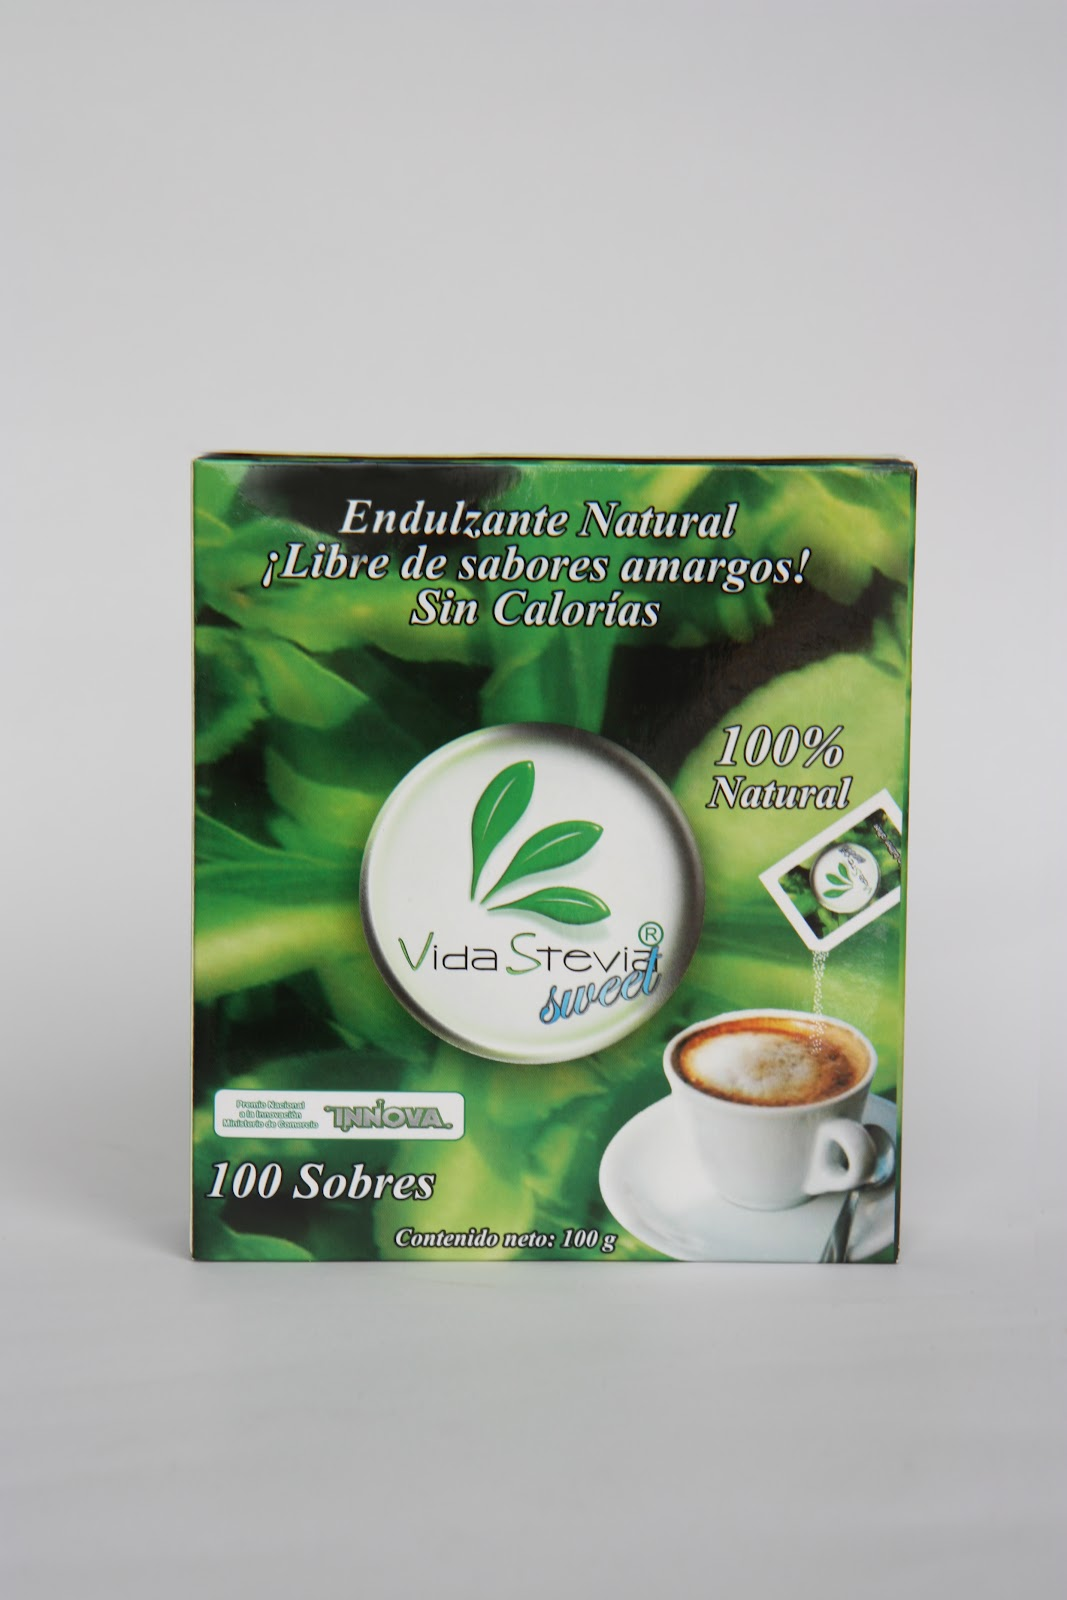 Productos naturales en Colombia www.stevia.com.co